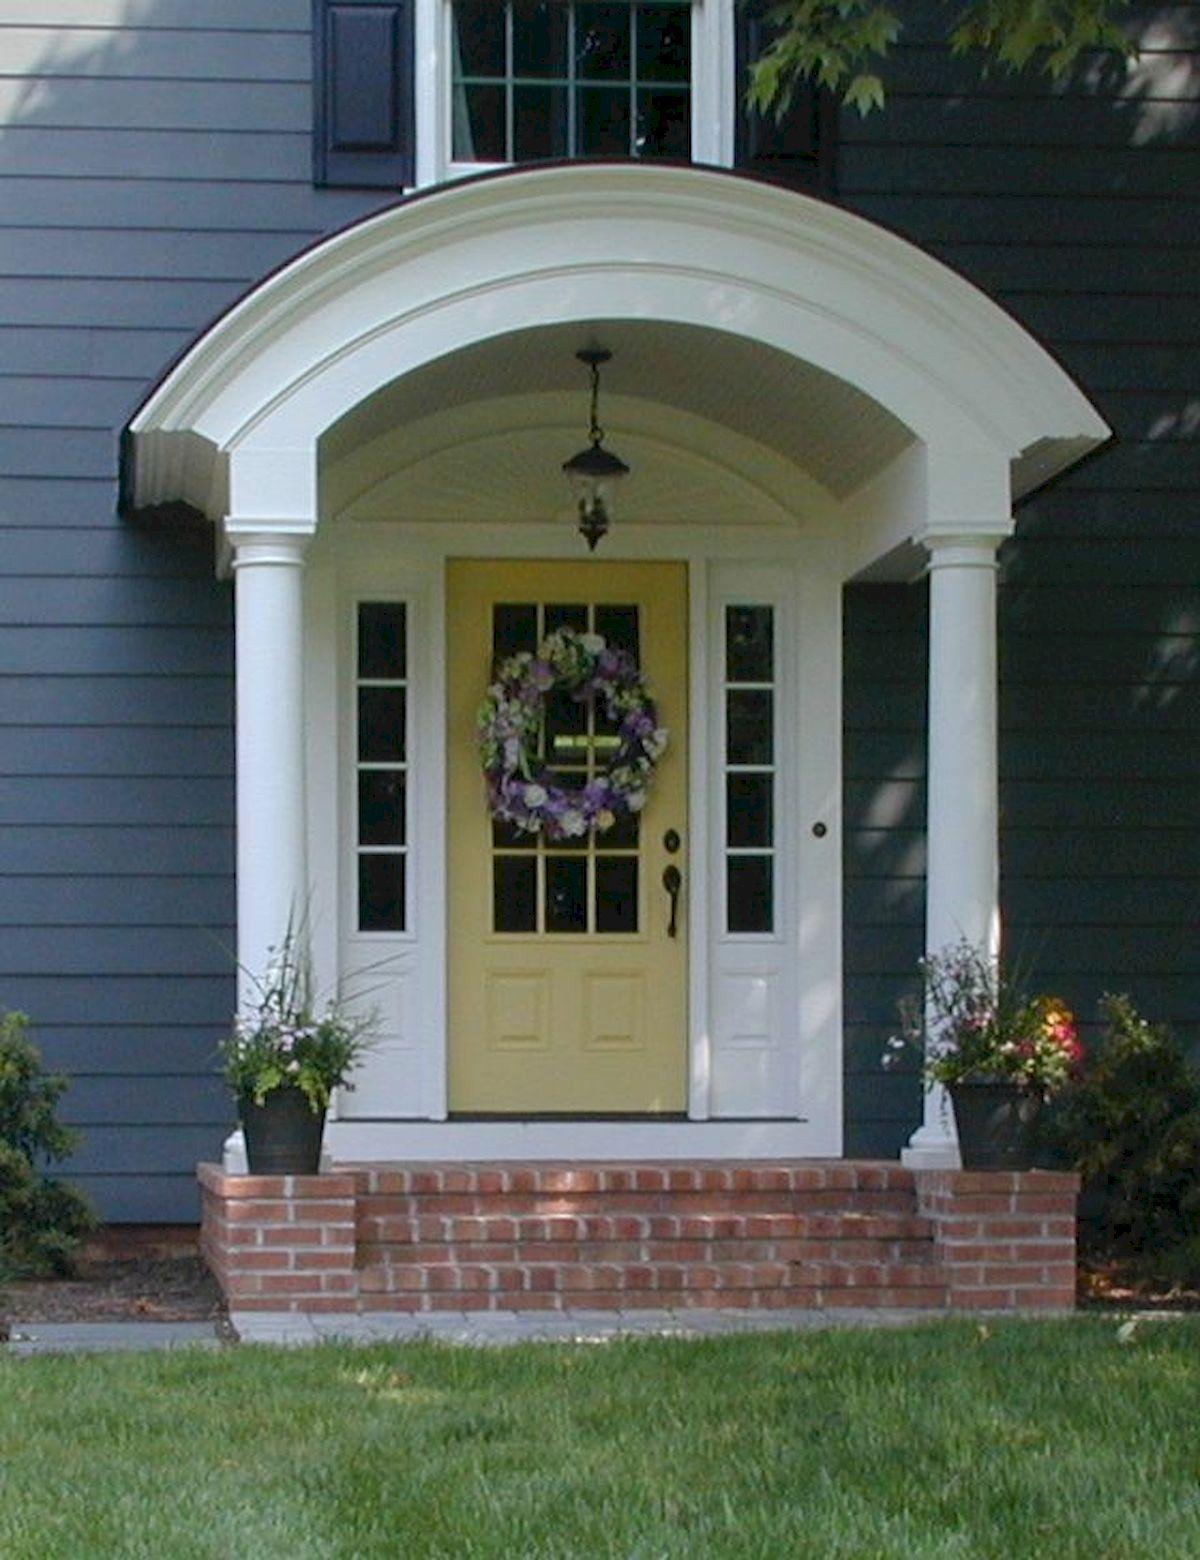 70 Stunning Exterior House Design Ideas (15)